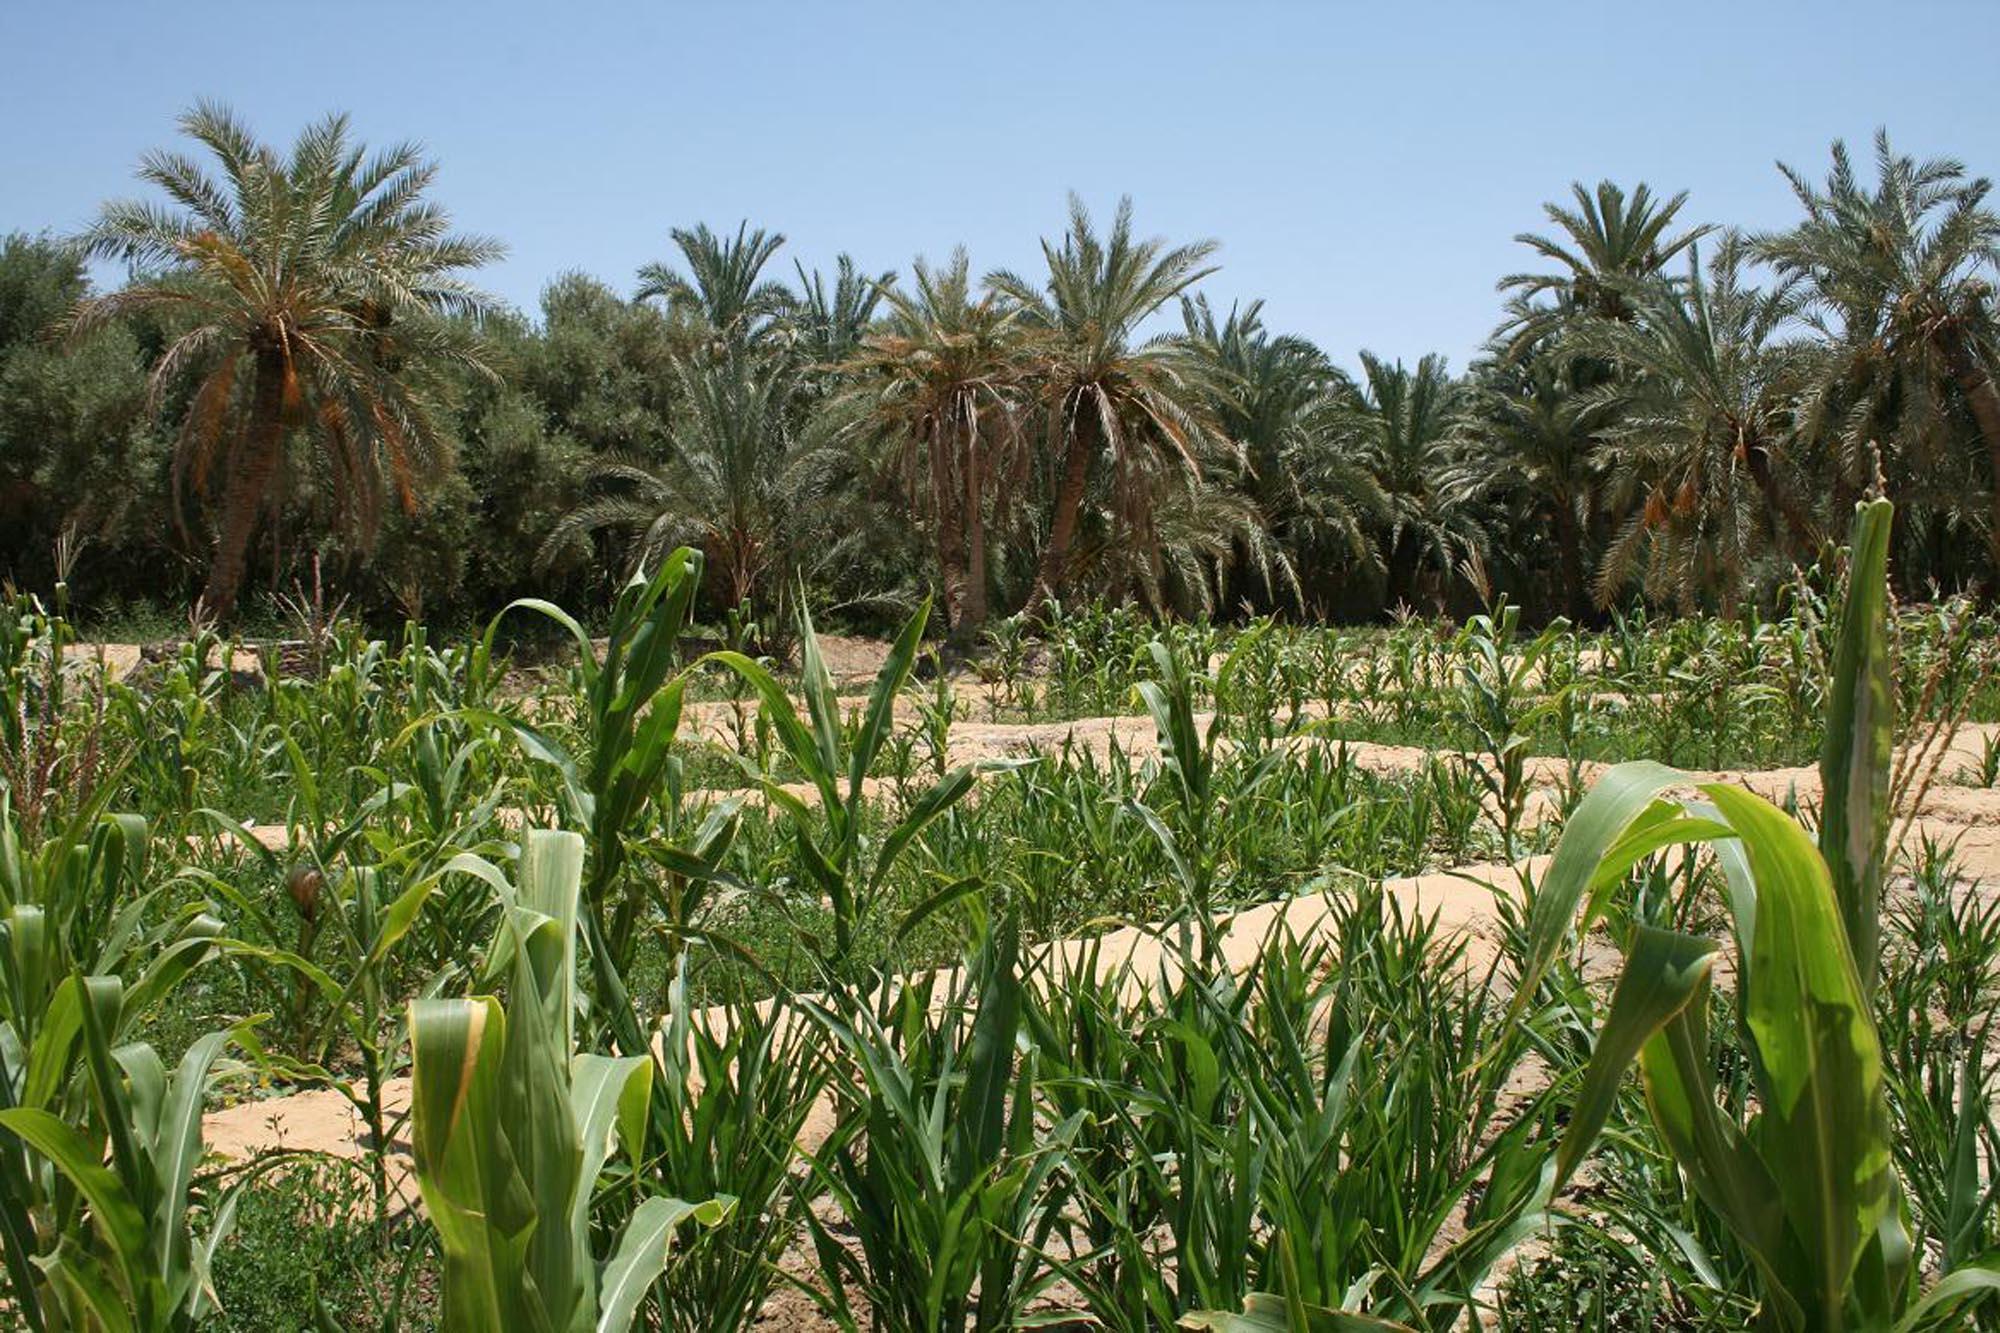 Organic corn and alfalfa